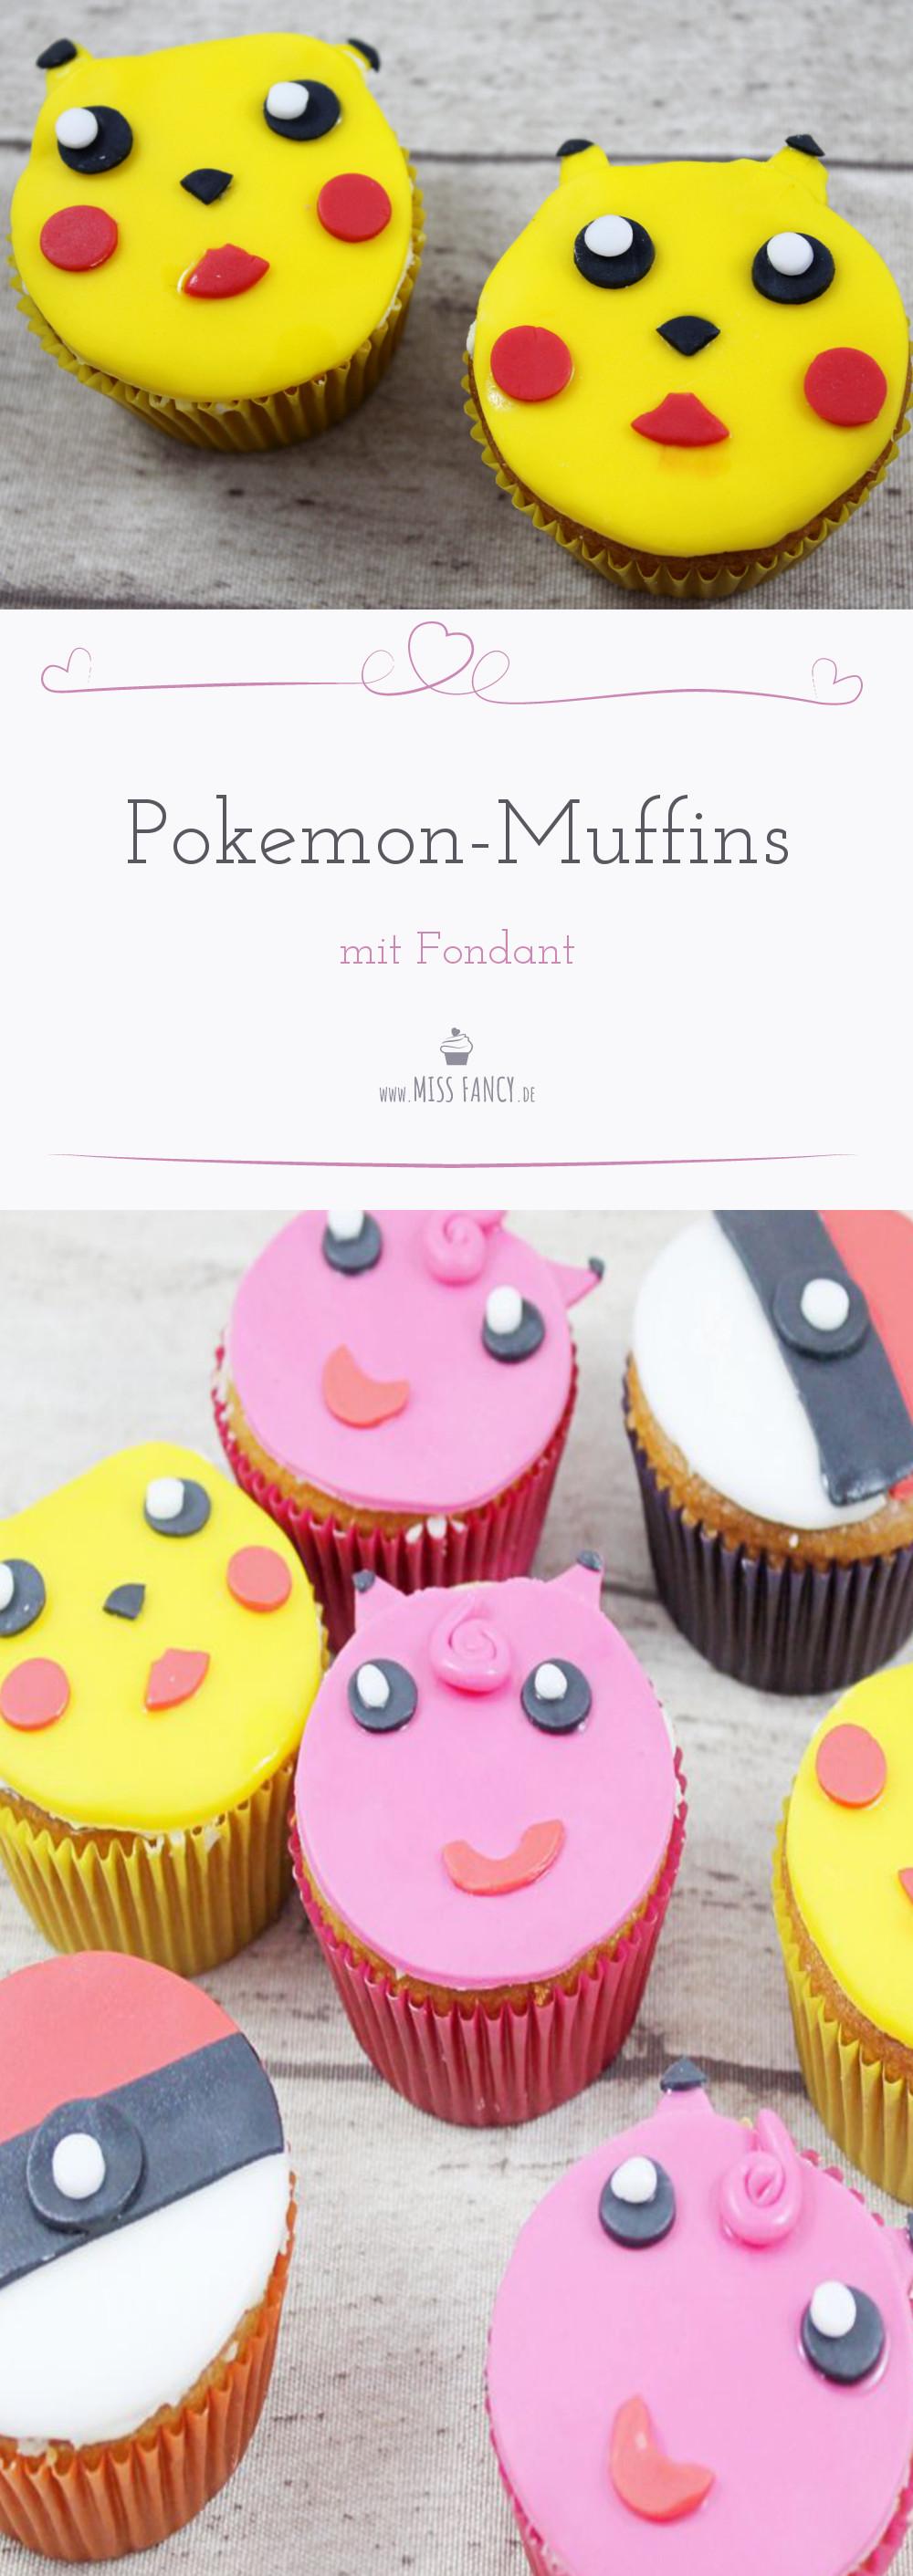 Pokemon Muffins Mit Fondant Miss Fancy Lifestyle Blog